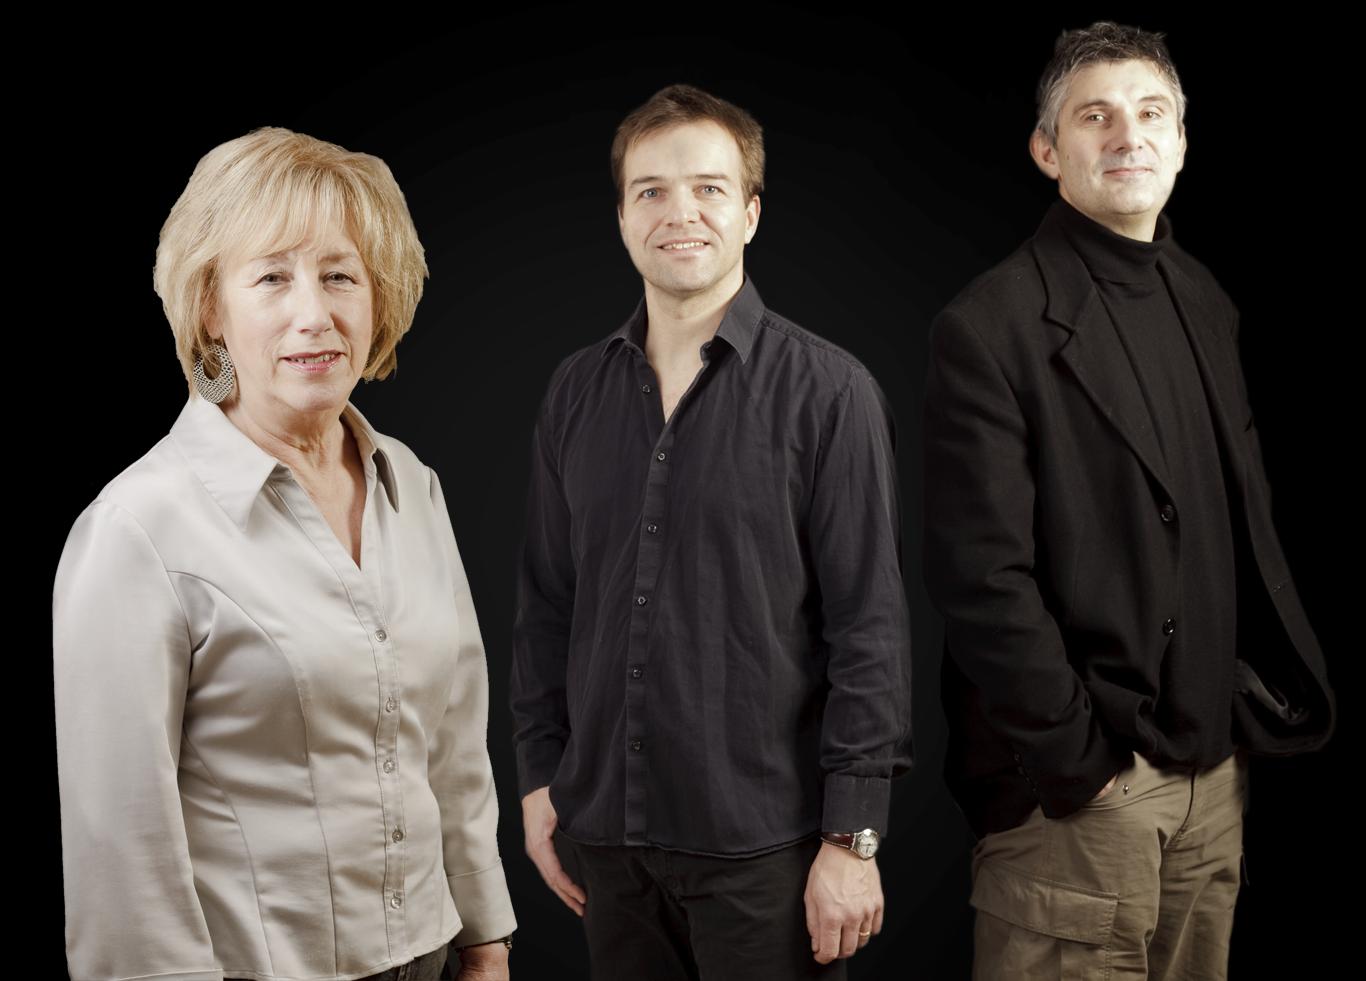 Norma Winstone, Glauco Vernier and Klaus Gesing.